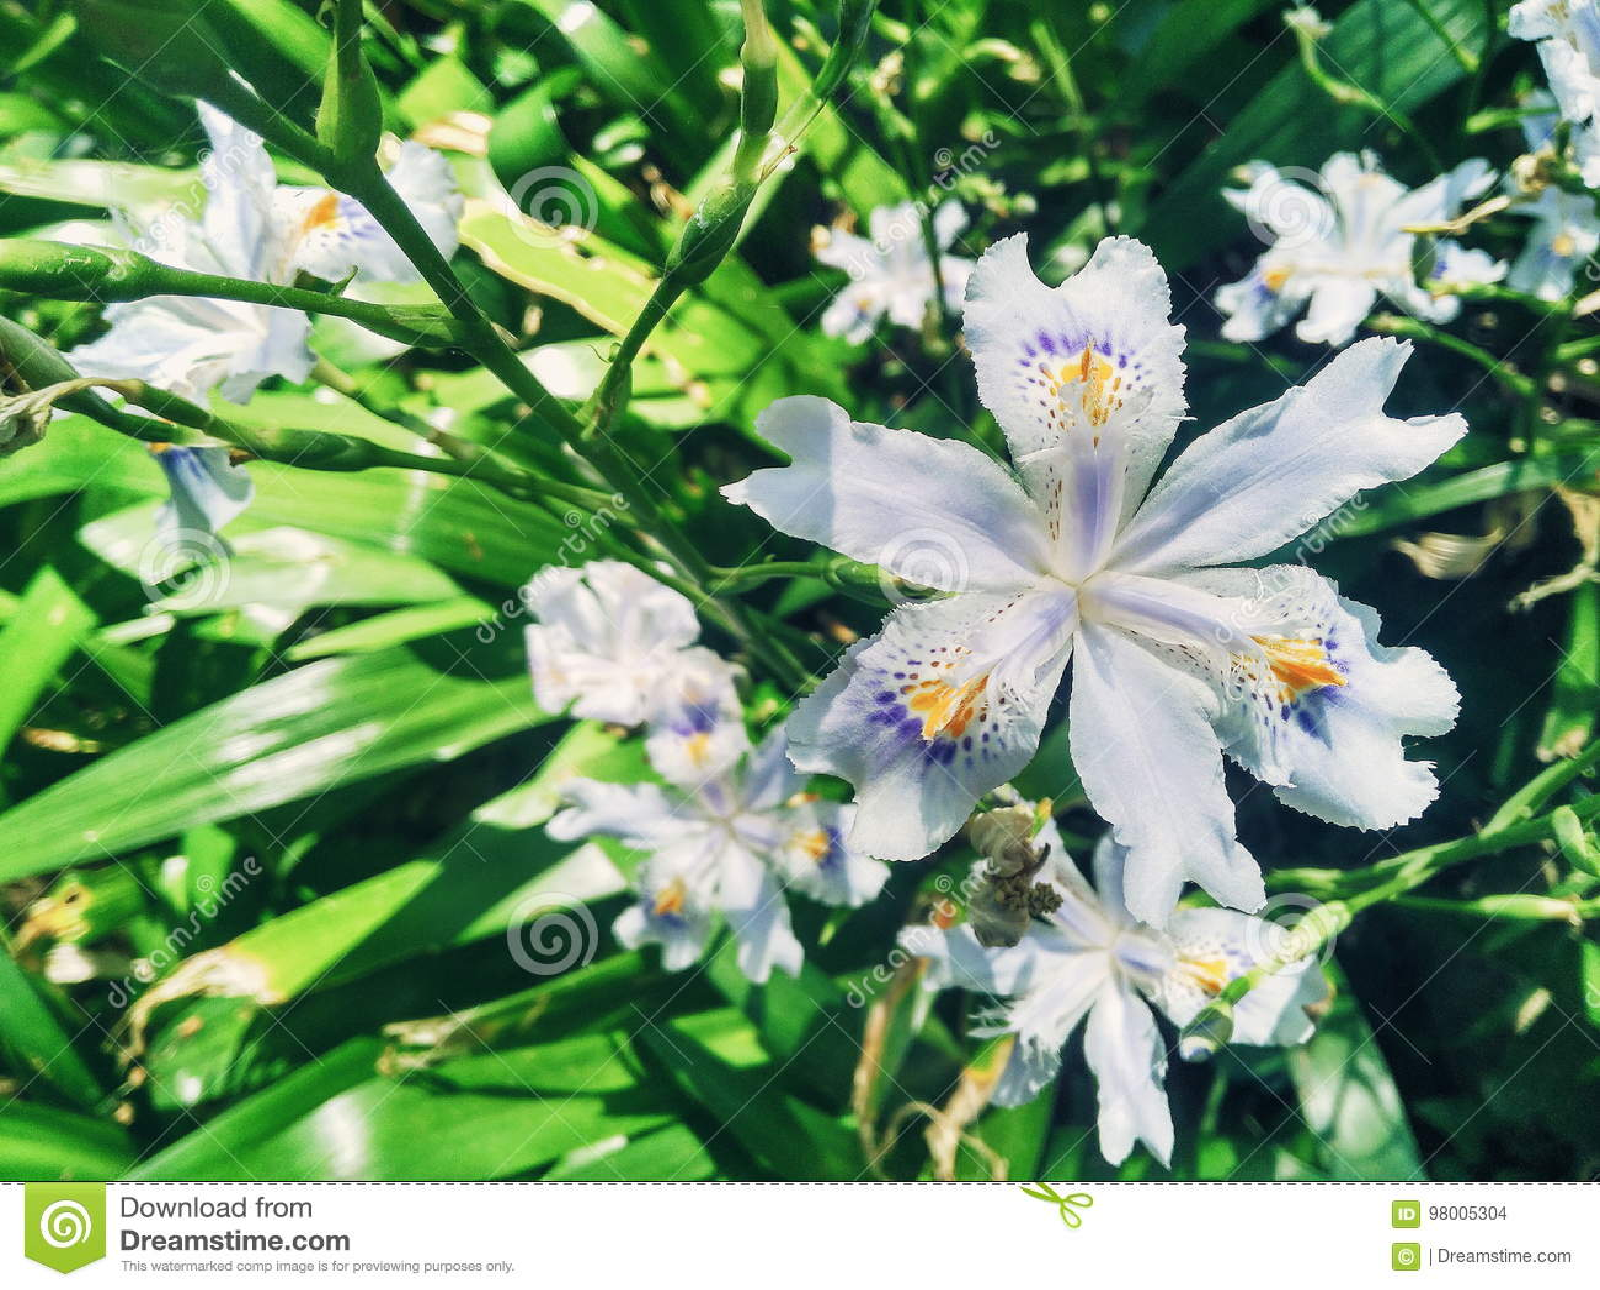 White Flower Six Petal Stock Photo Image Of Petal Flower 98005304